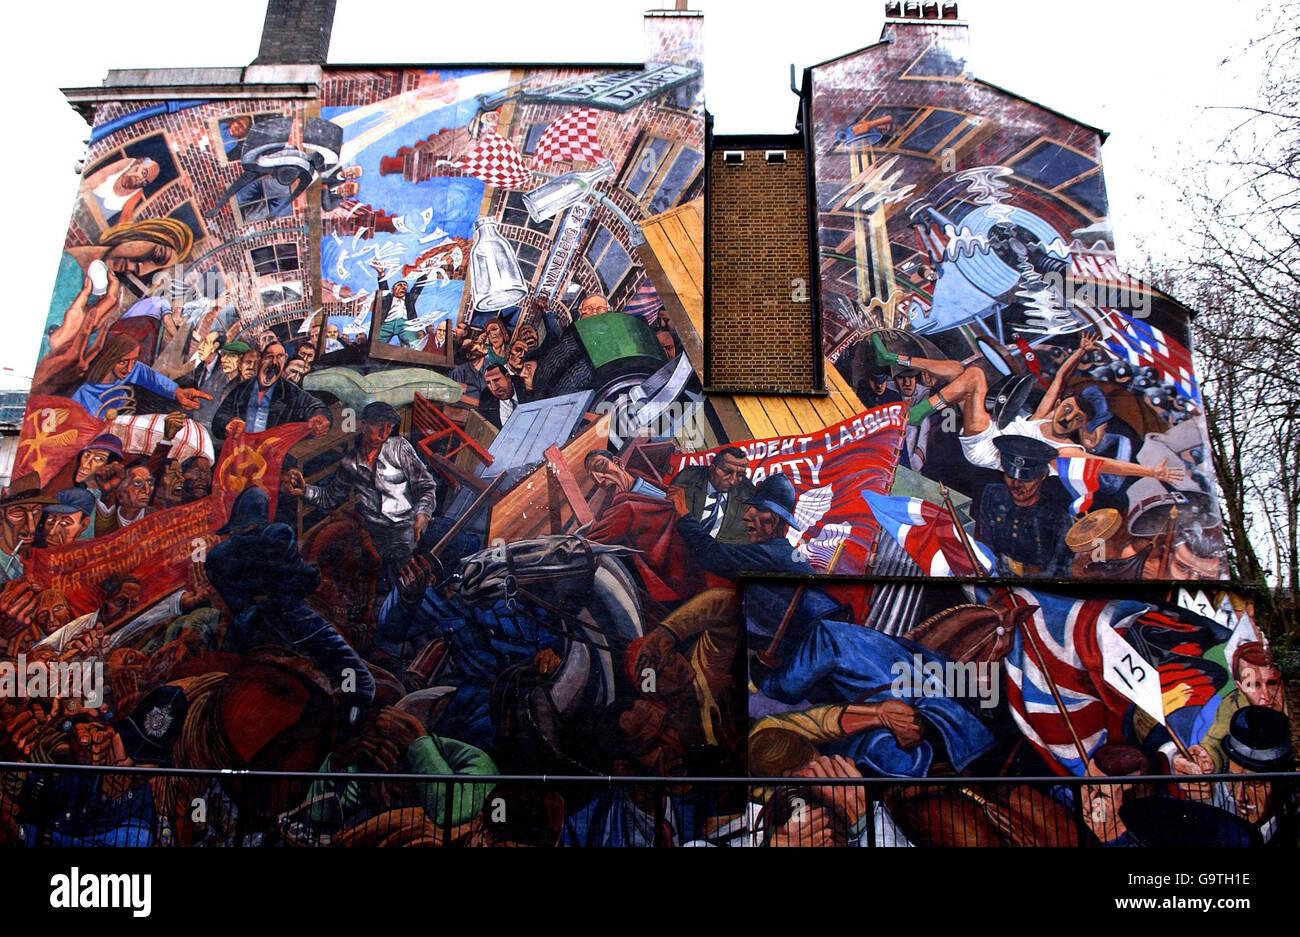 London murals - Stock Image